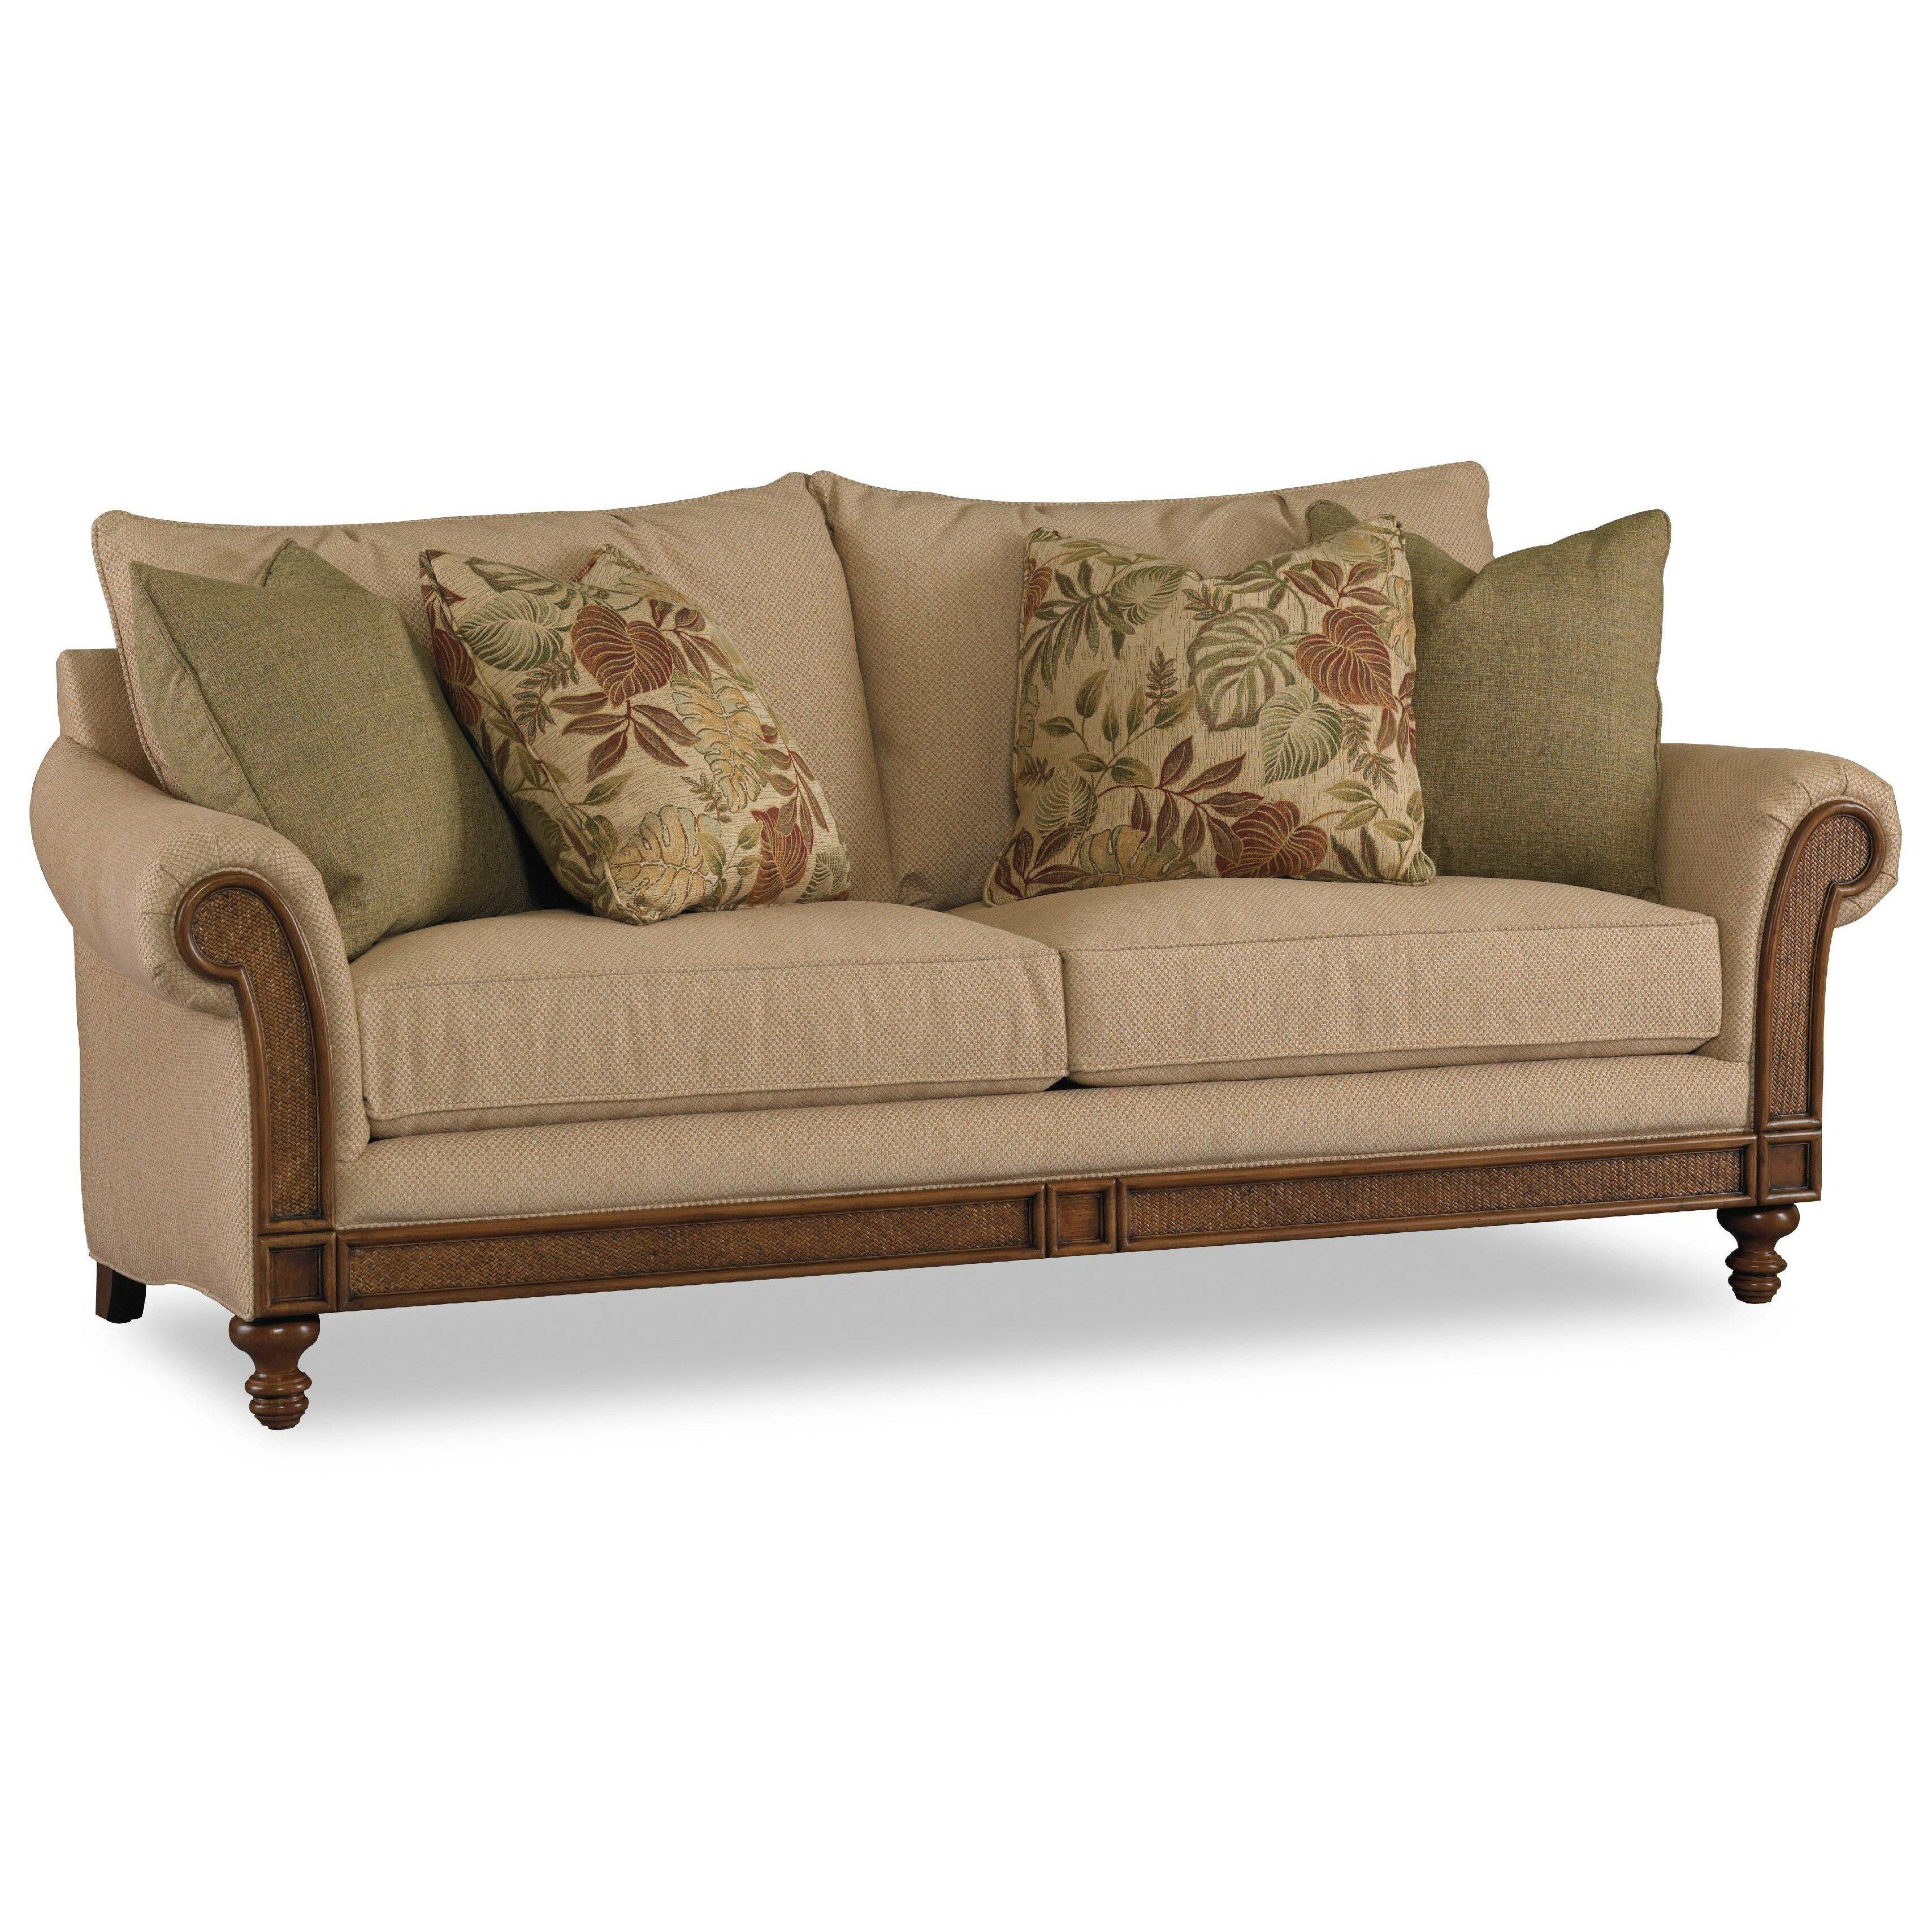 Hooker Furniture Windward Sofa Reviews